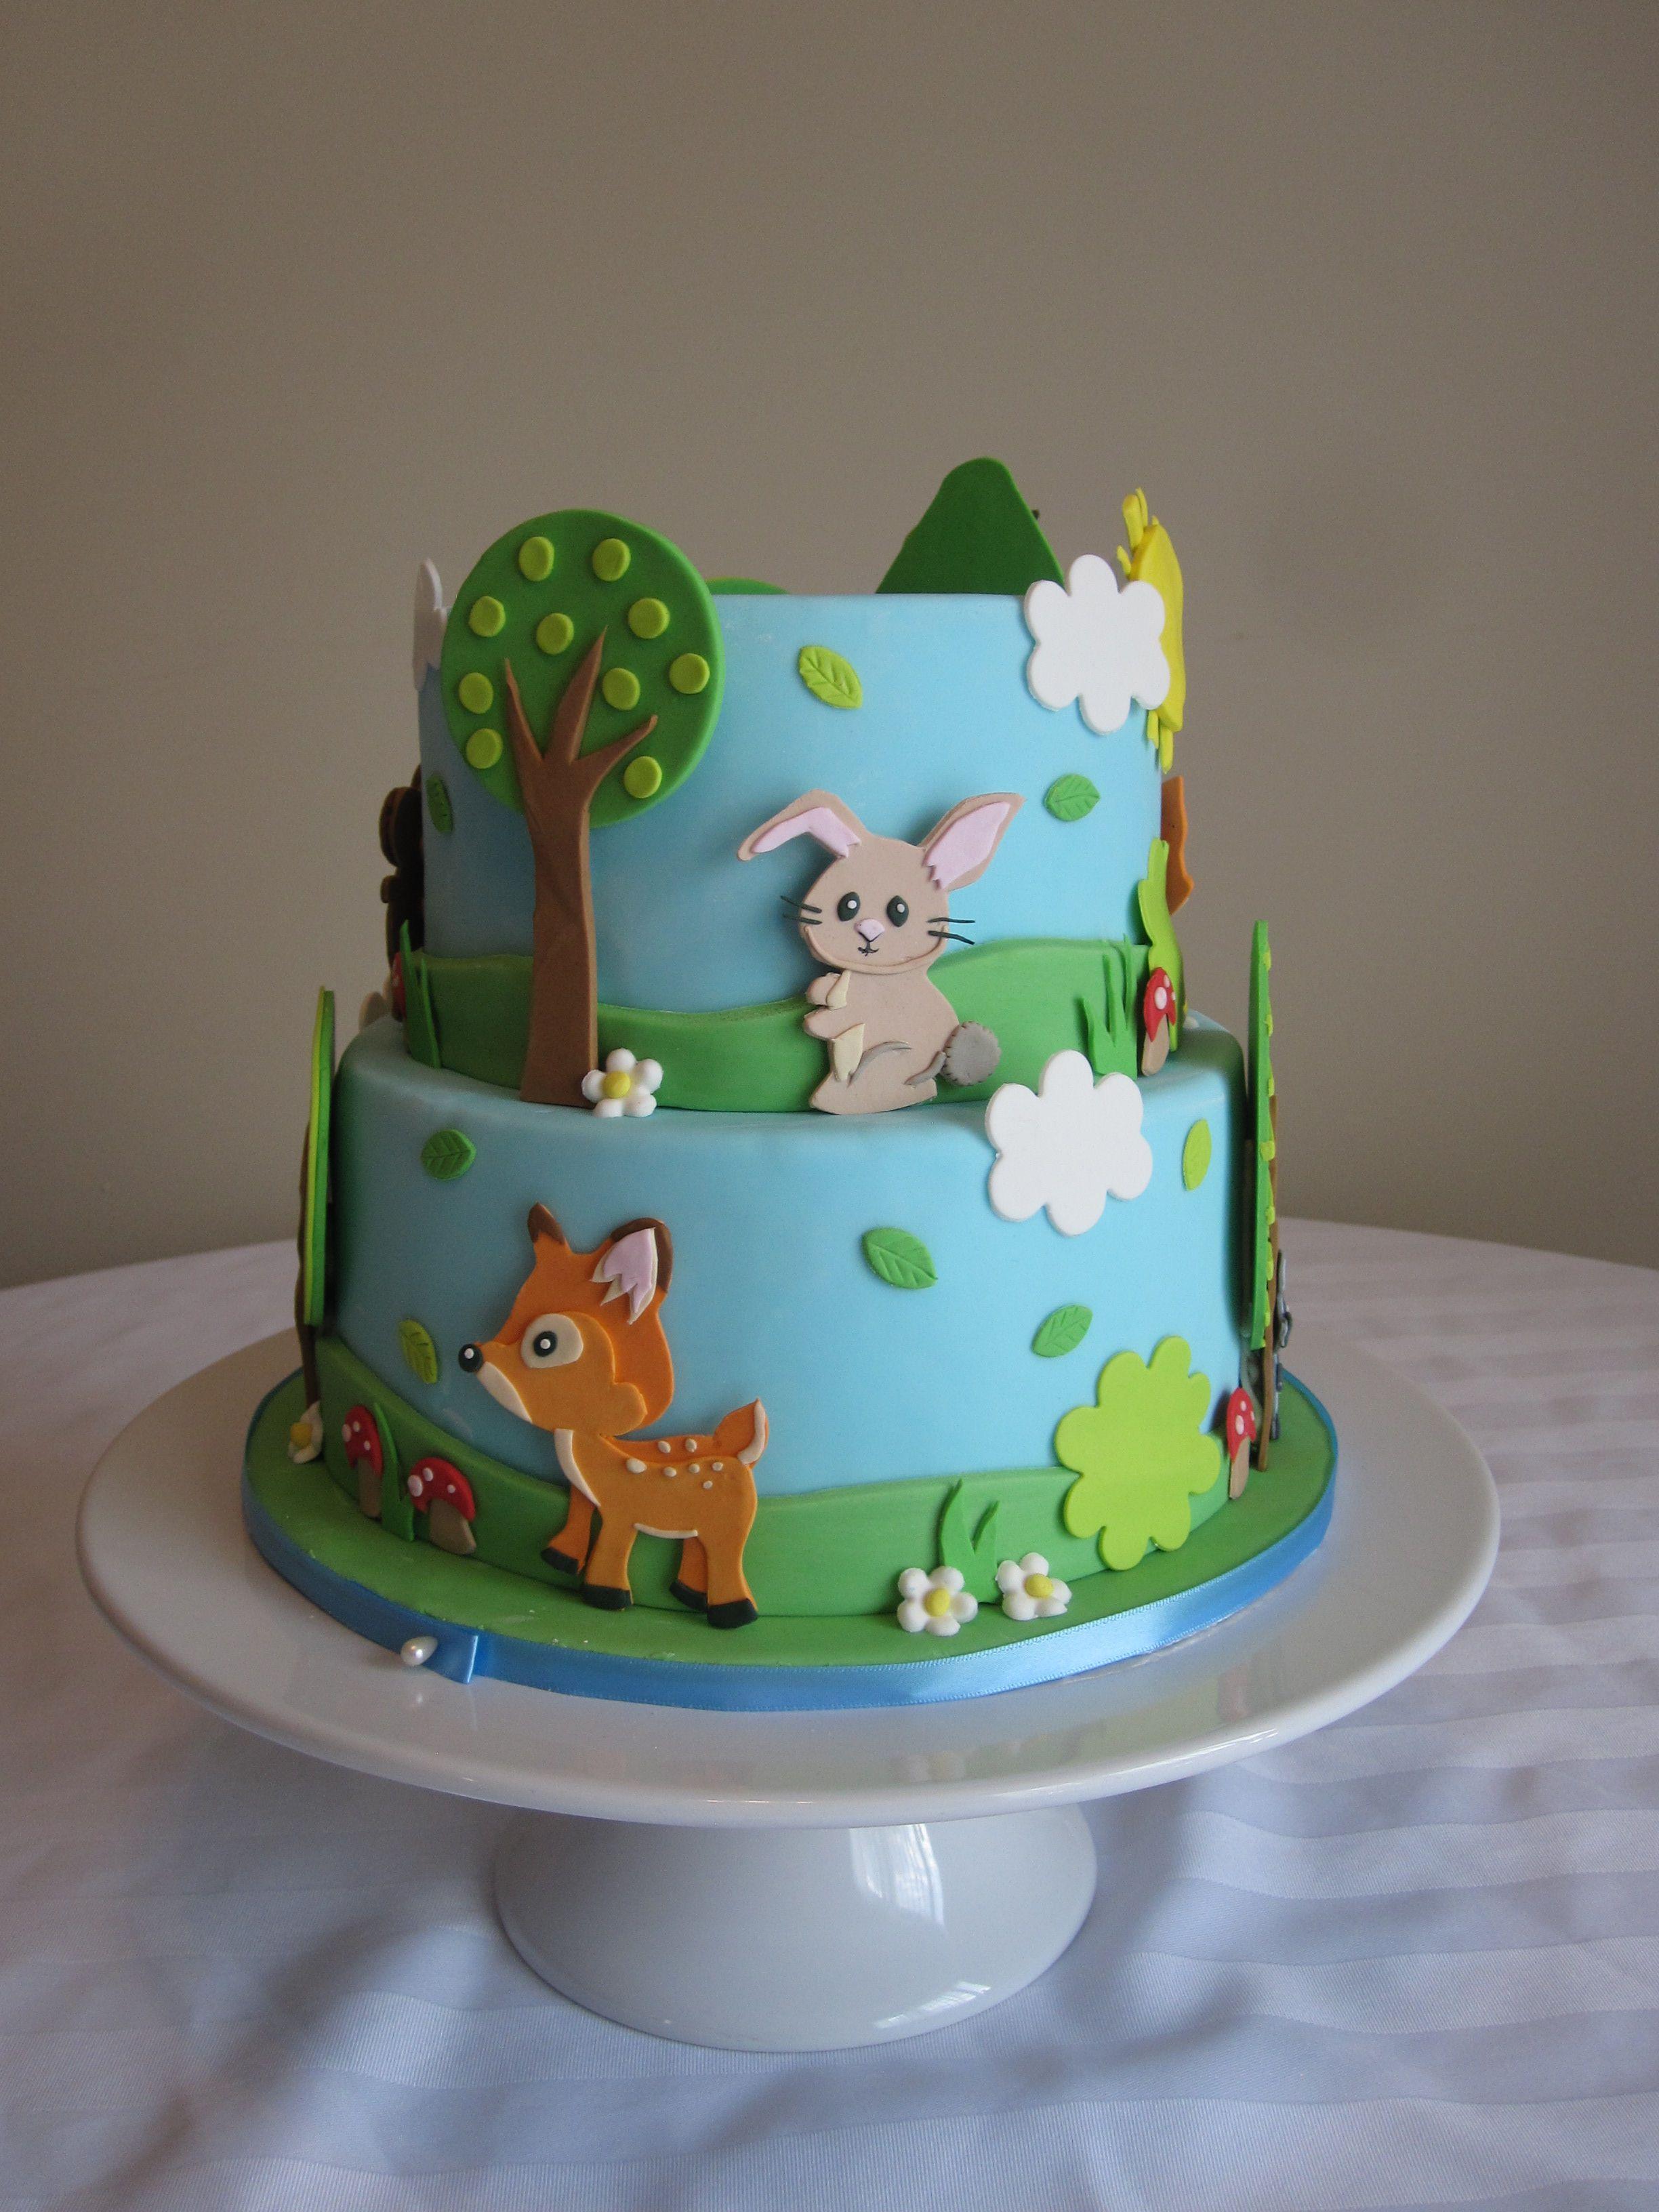 Pin By Sarah Kelly On Cakes Woodland Birthday Cake Animal Cake Cake Decorating